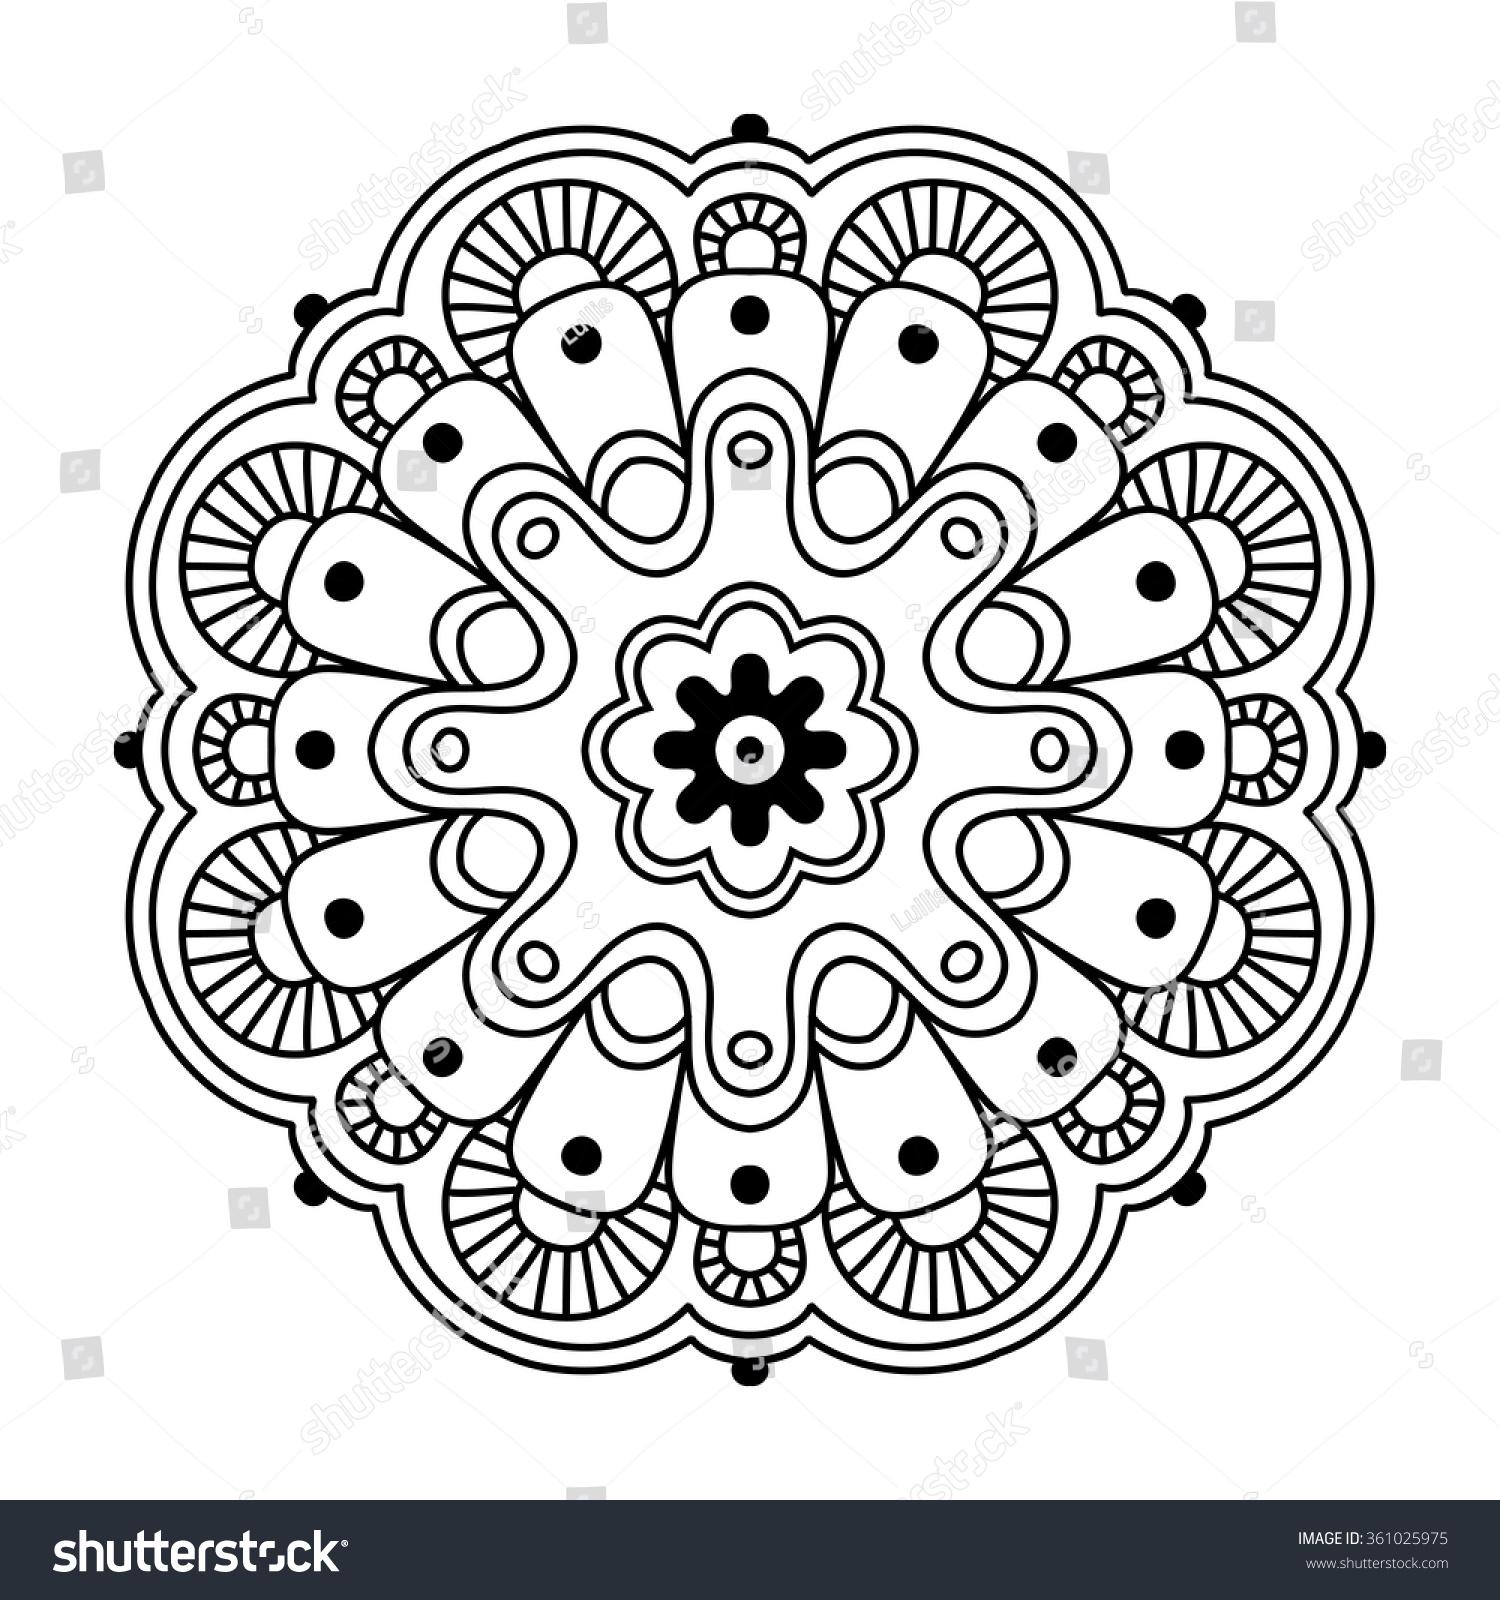 Black Round Simple Indian Mandala Abstract Stock Vector ...   1500 x 1600 jpeg 572kB